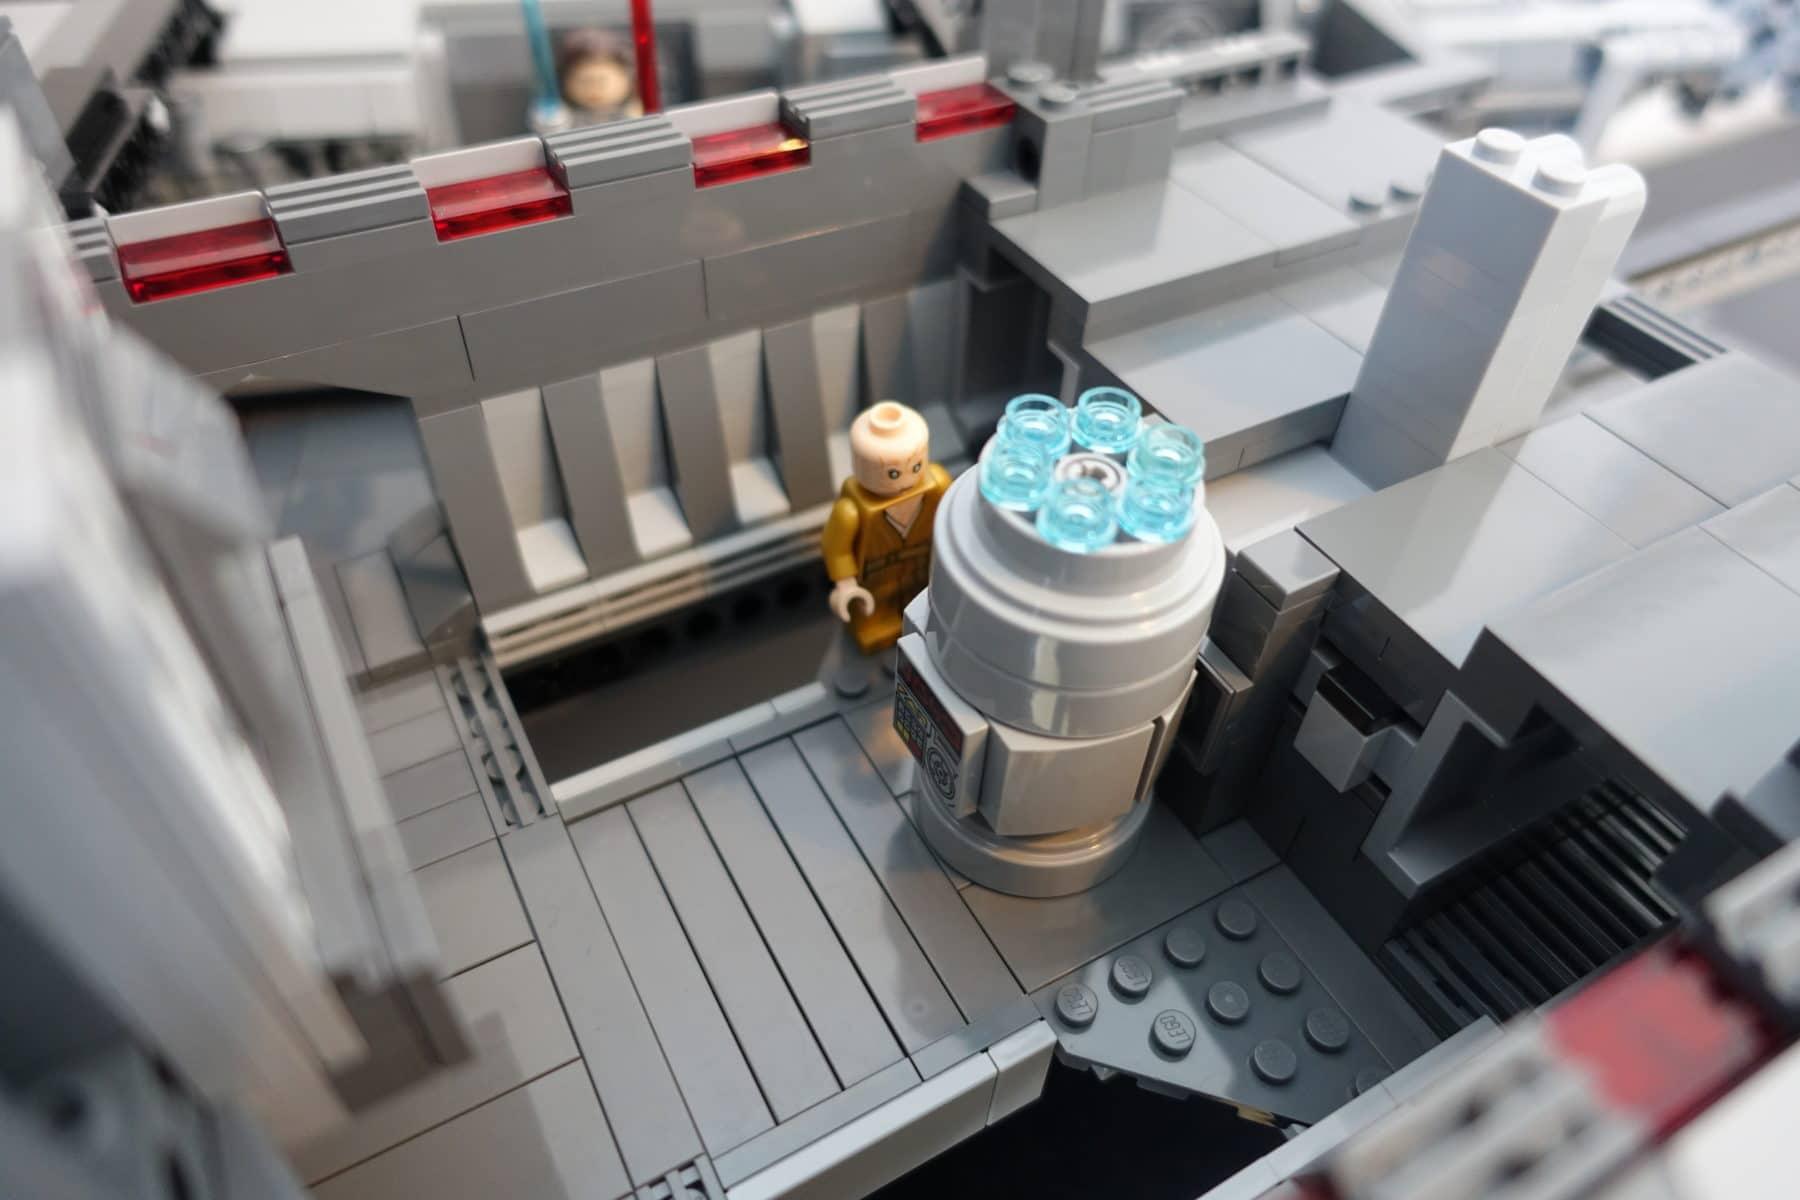 Reaktorraum des LEGO MOC Imperial Star Destroyers